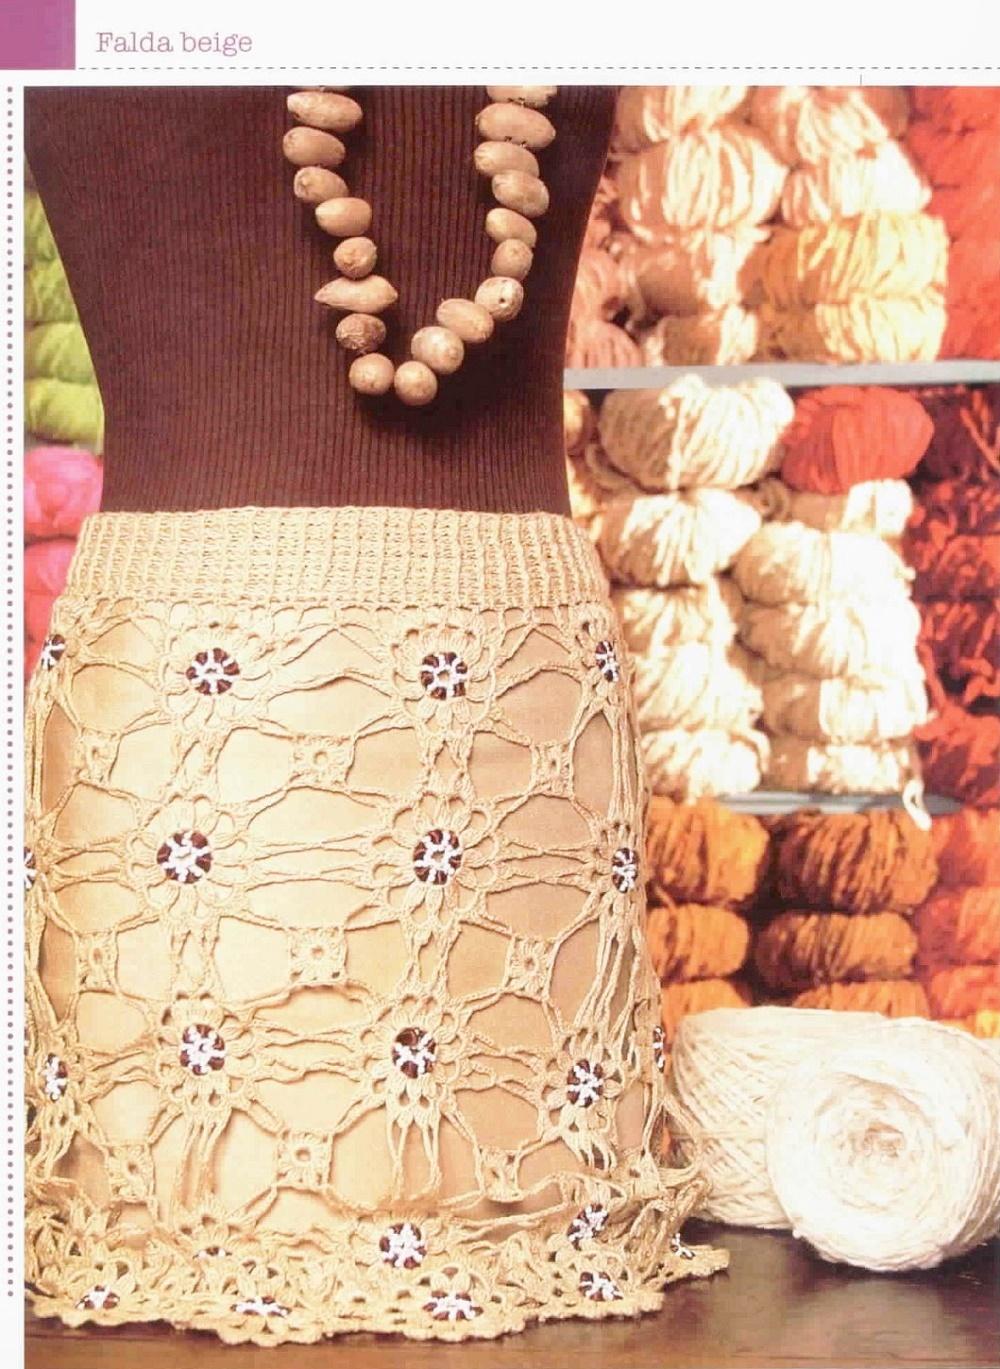 faldas ganchillo, faldas crochet, patrones crochet